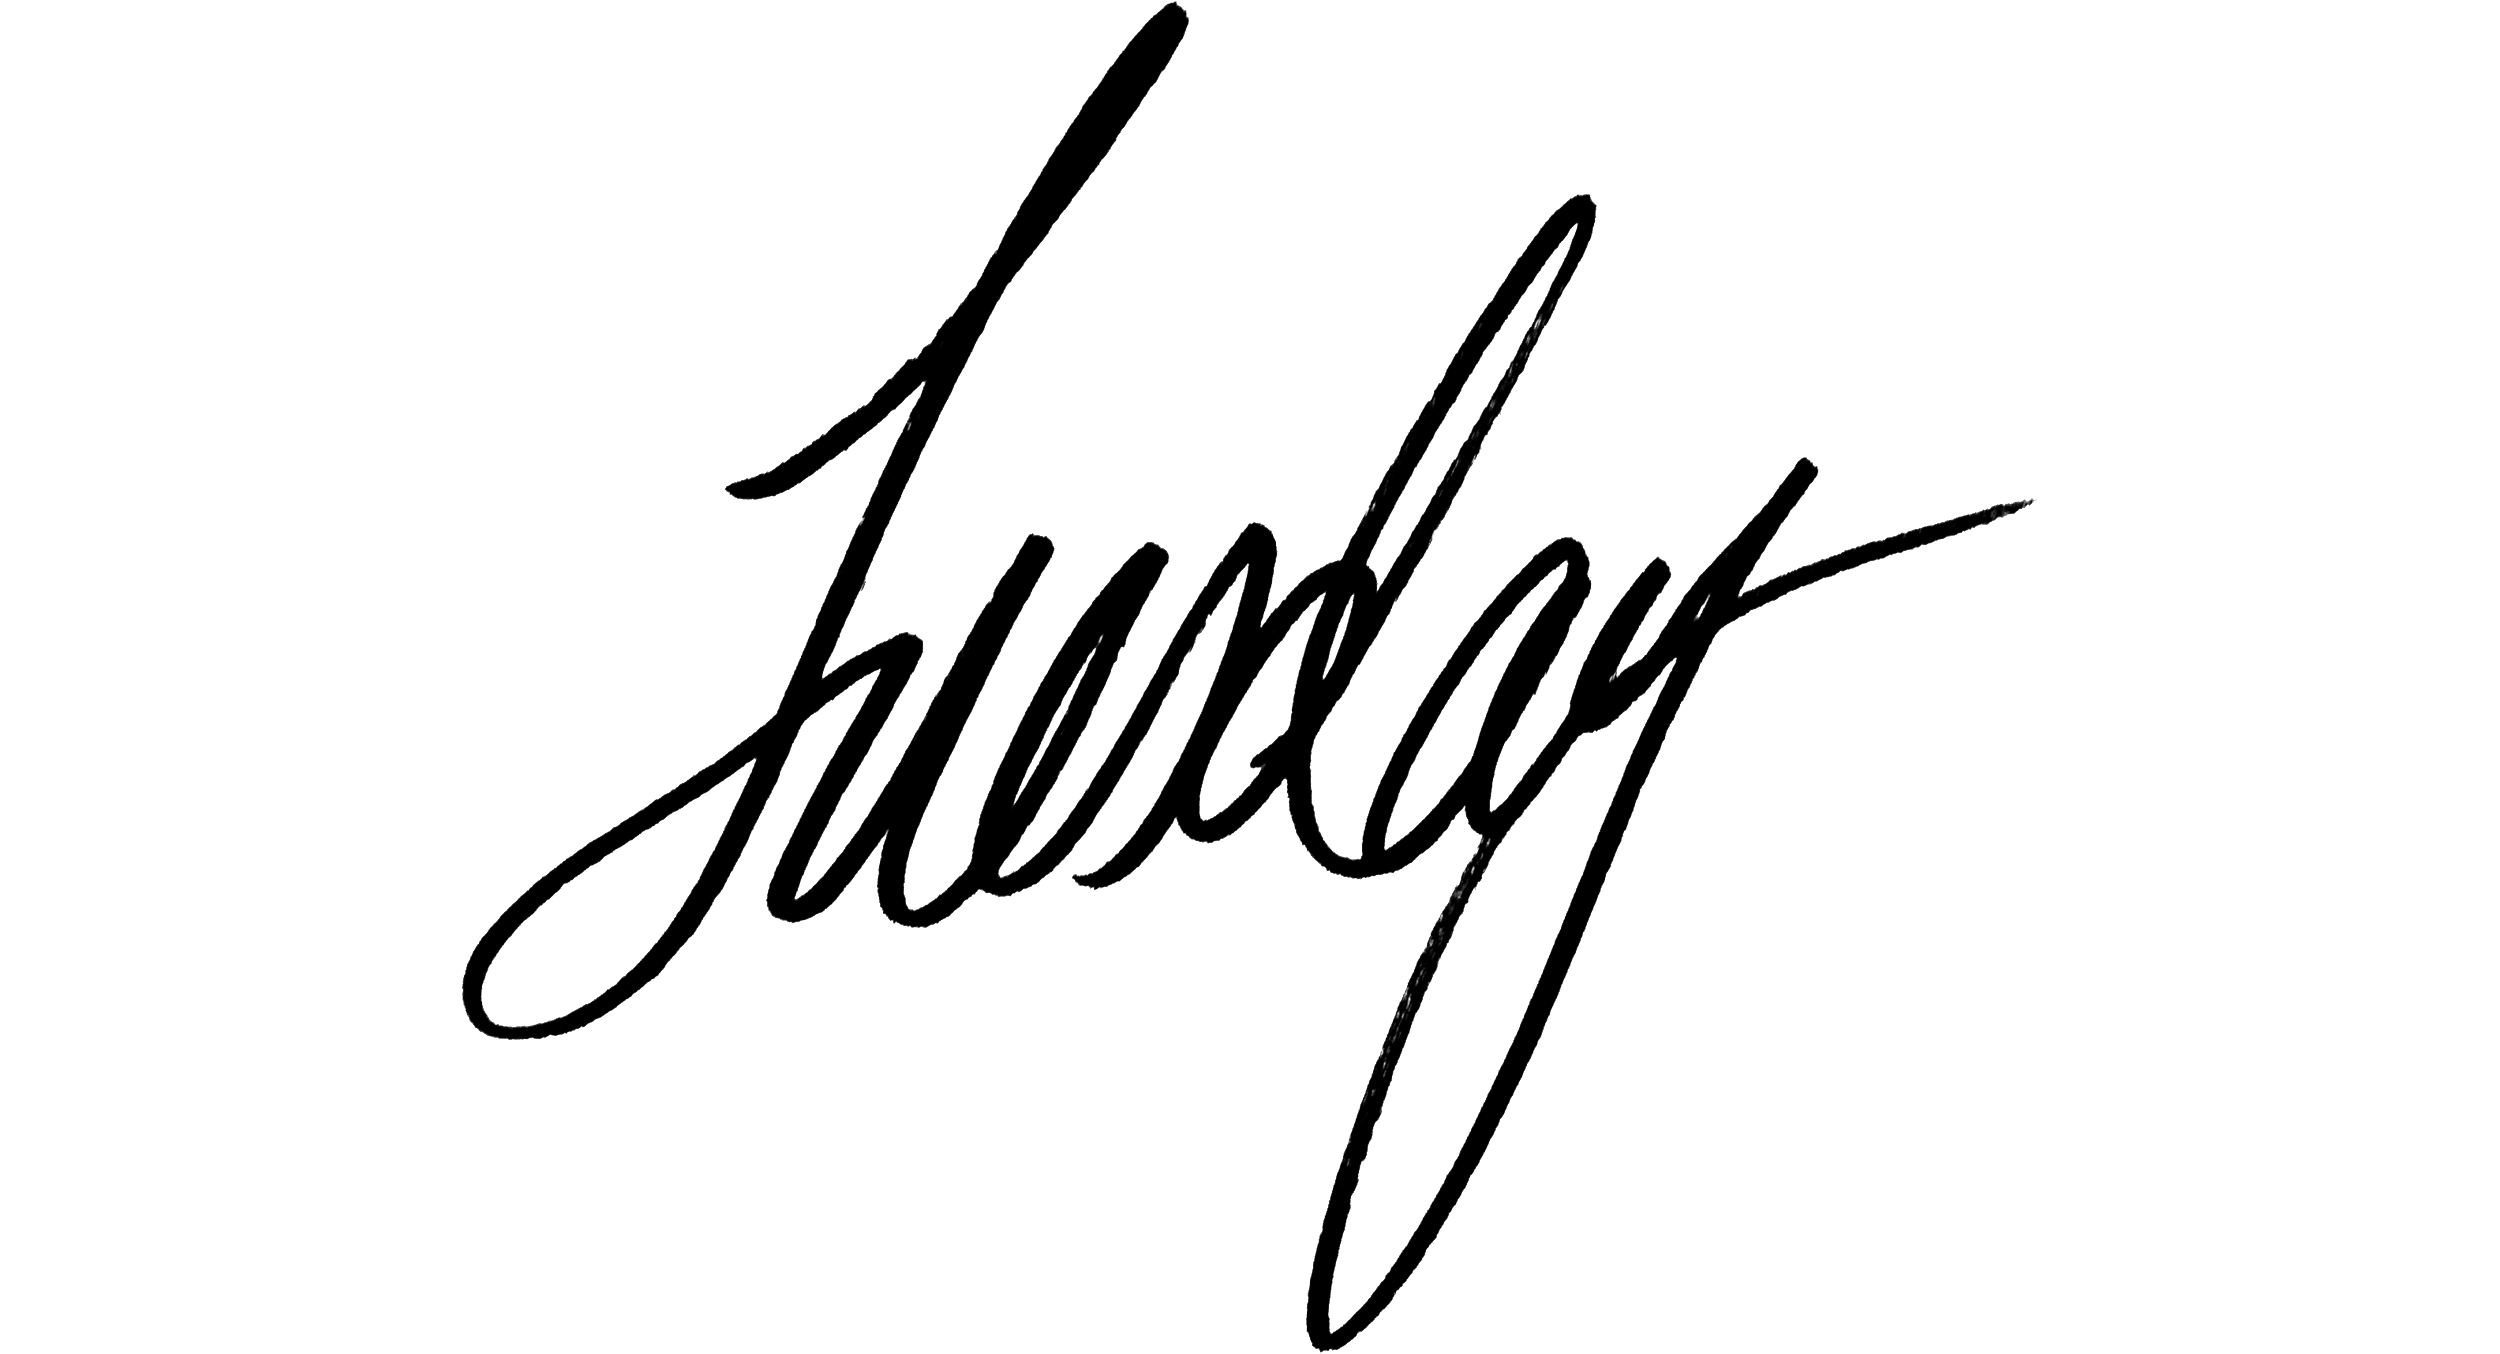 signatures_TUES4_transparent-2.png